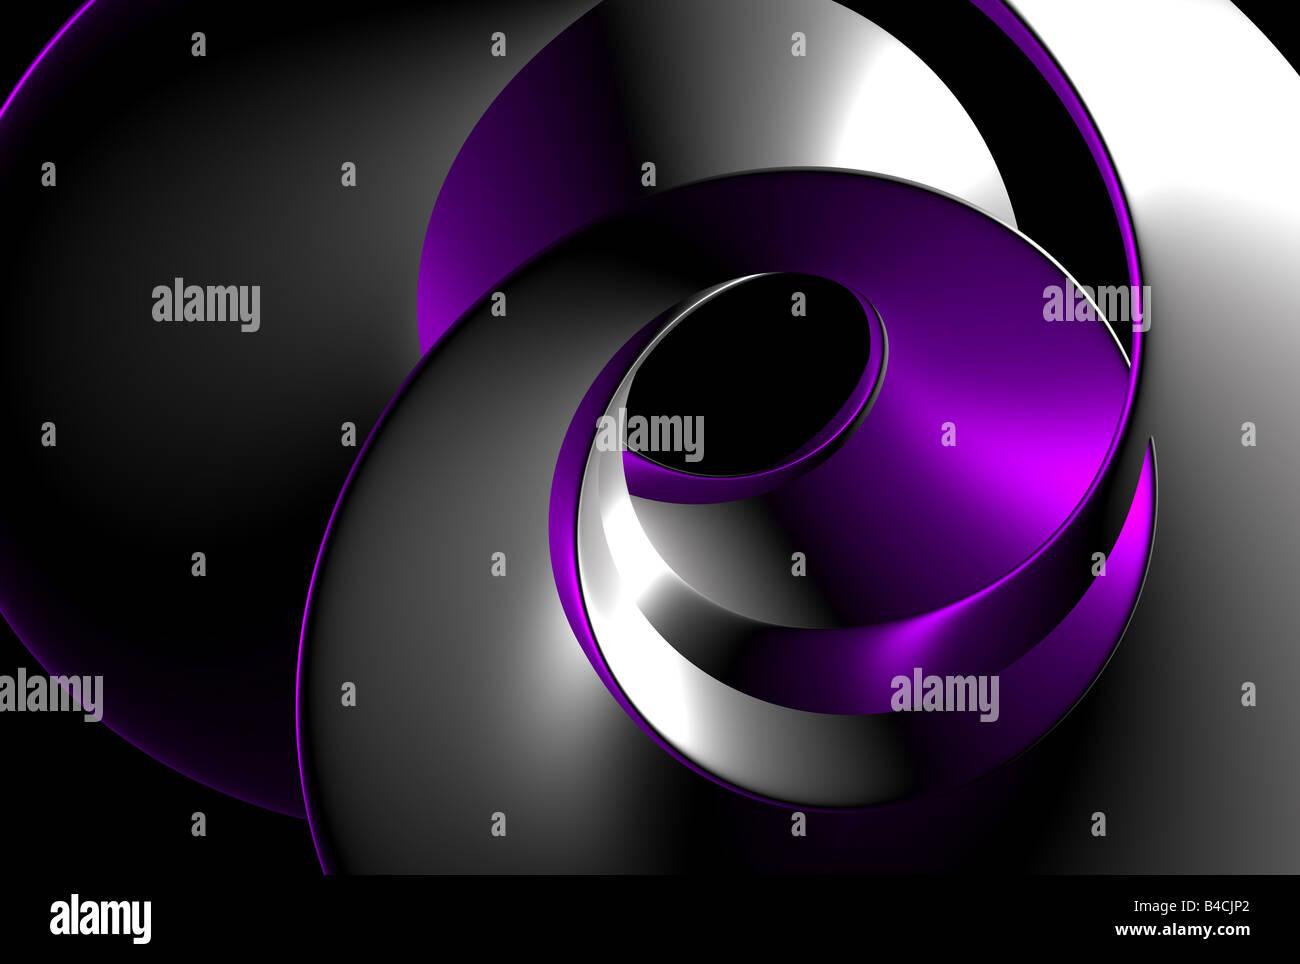 Abstraktion 3d Abstract Stockbild